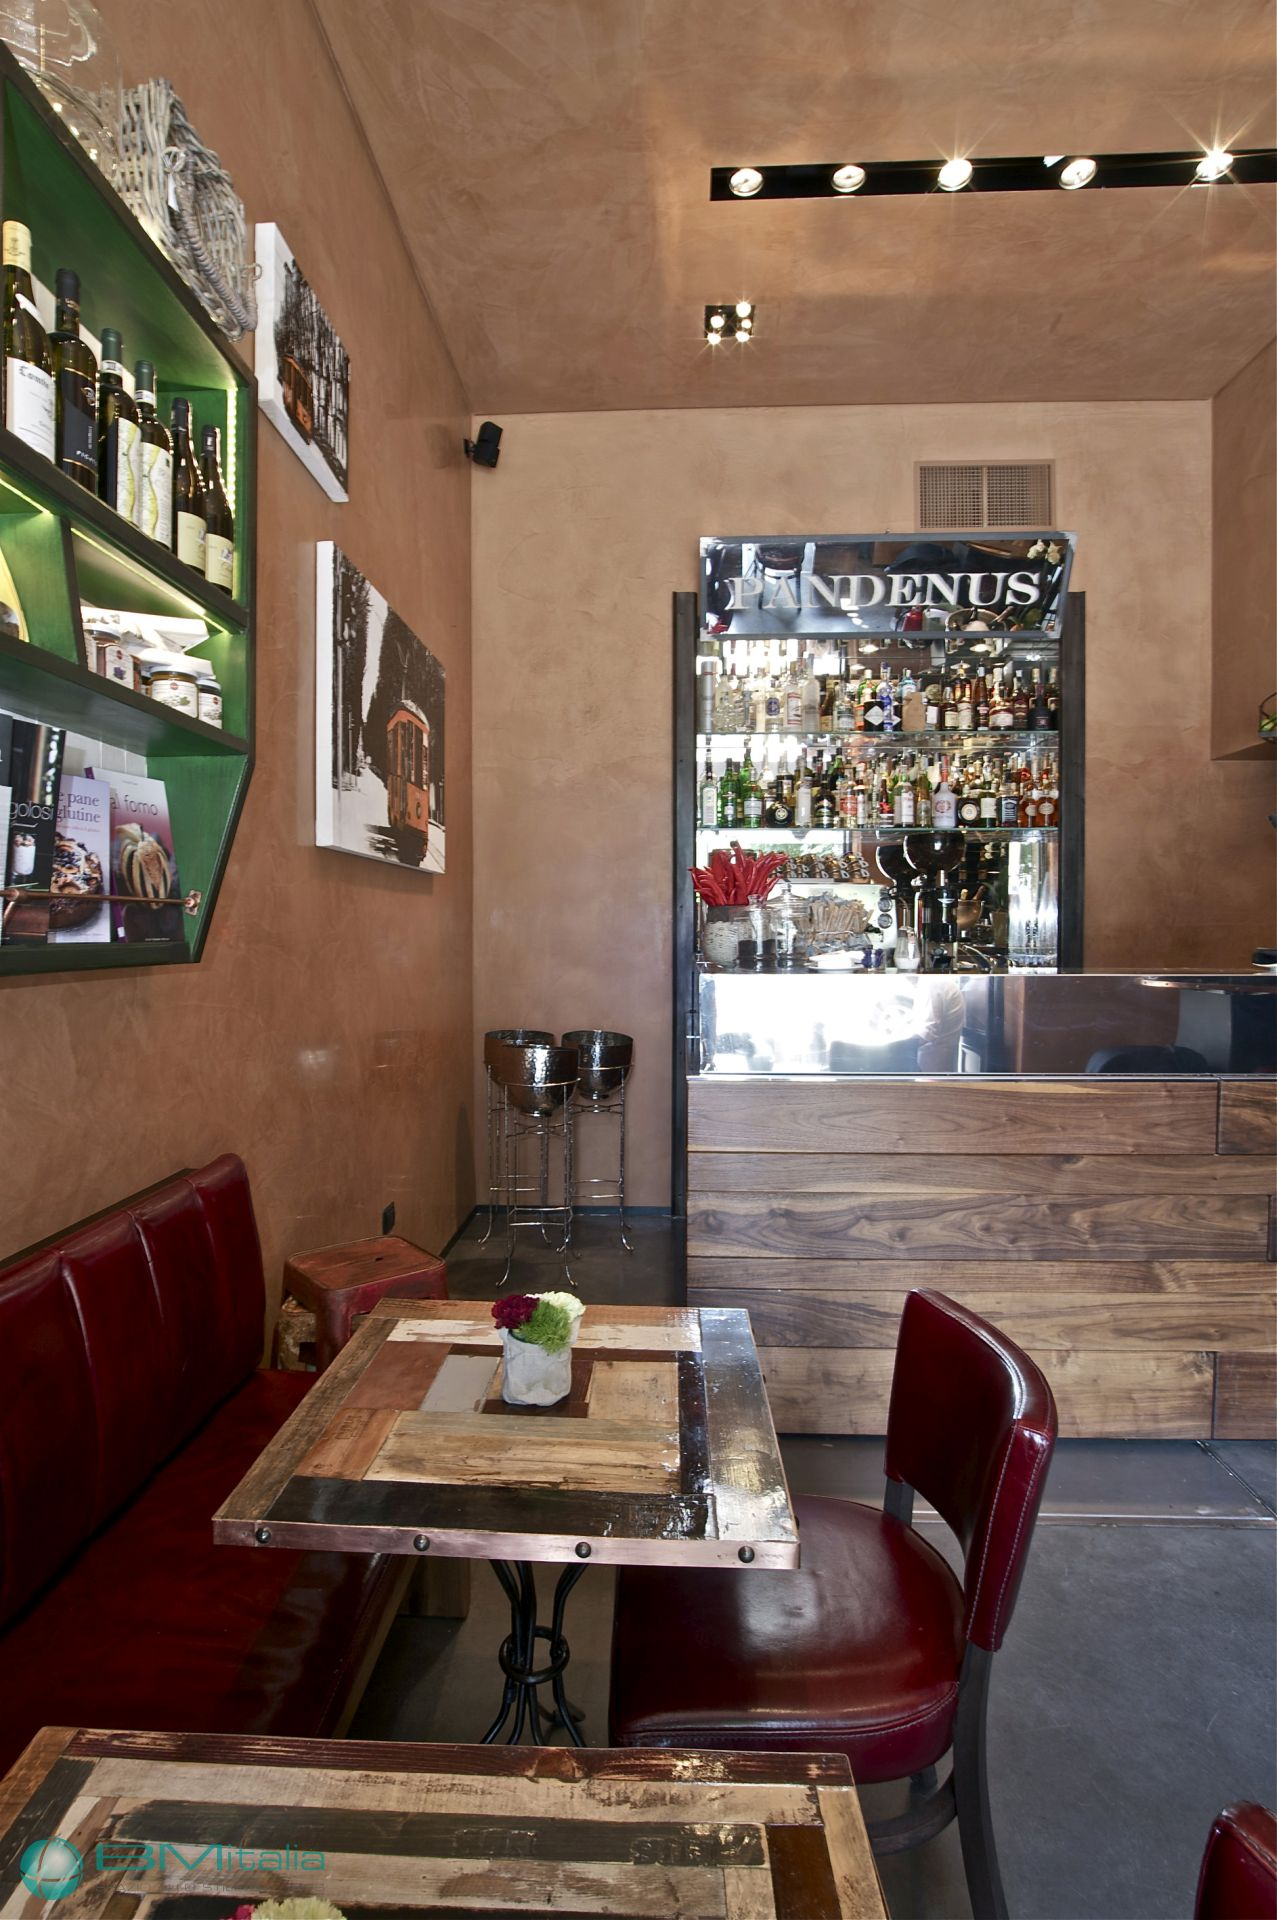 Arredamenti per locali pubblici panetterie bar caffetterie for Arredamenti per panifici